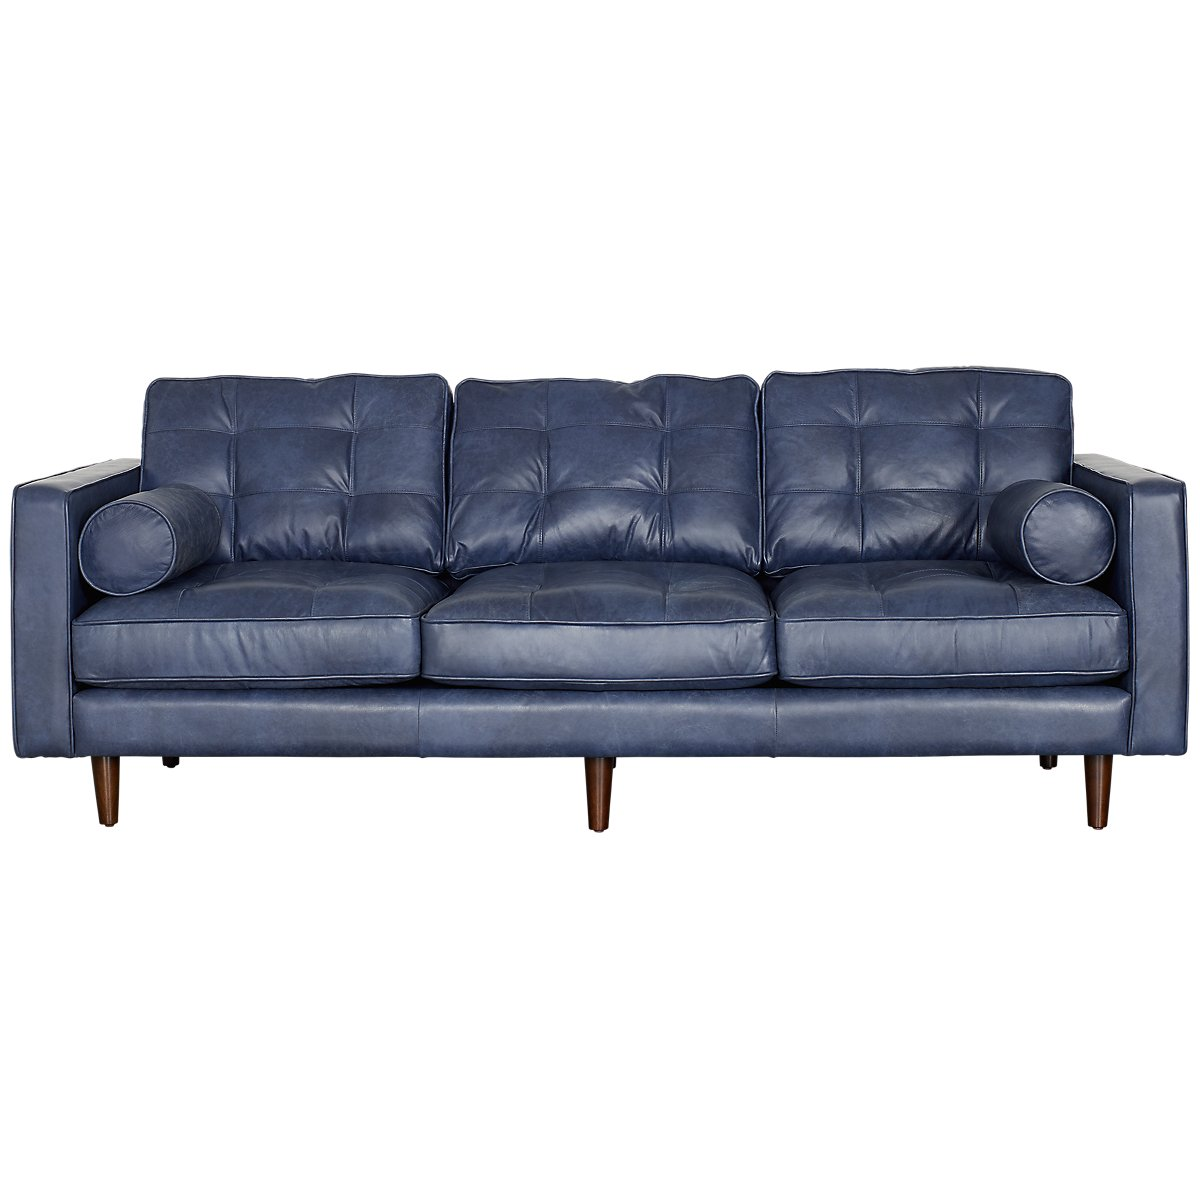 Encino Dark Blue Leather Sofa | Living Room - Sofas | City Furniture